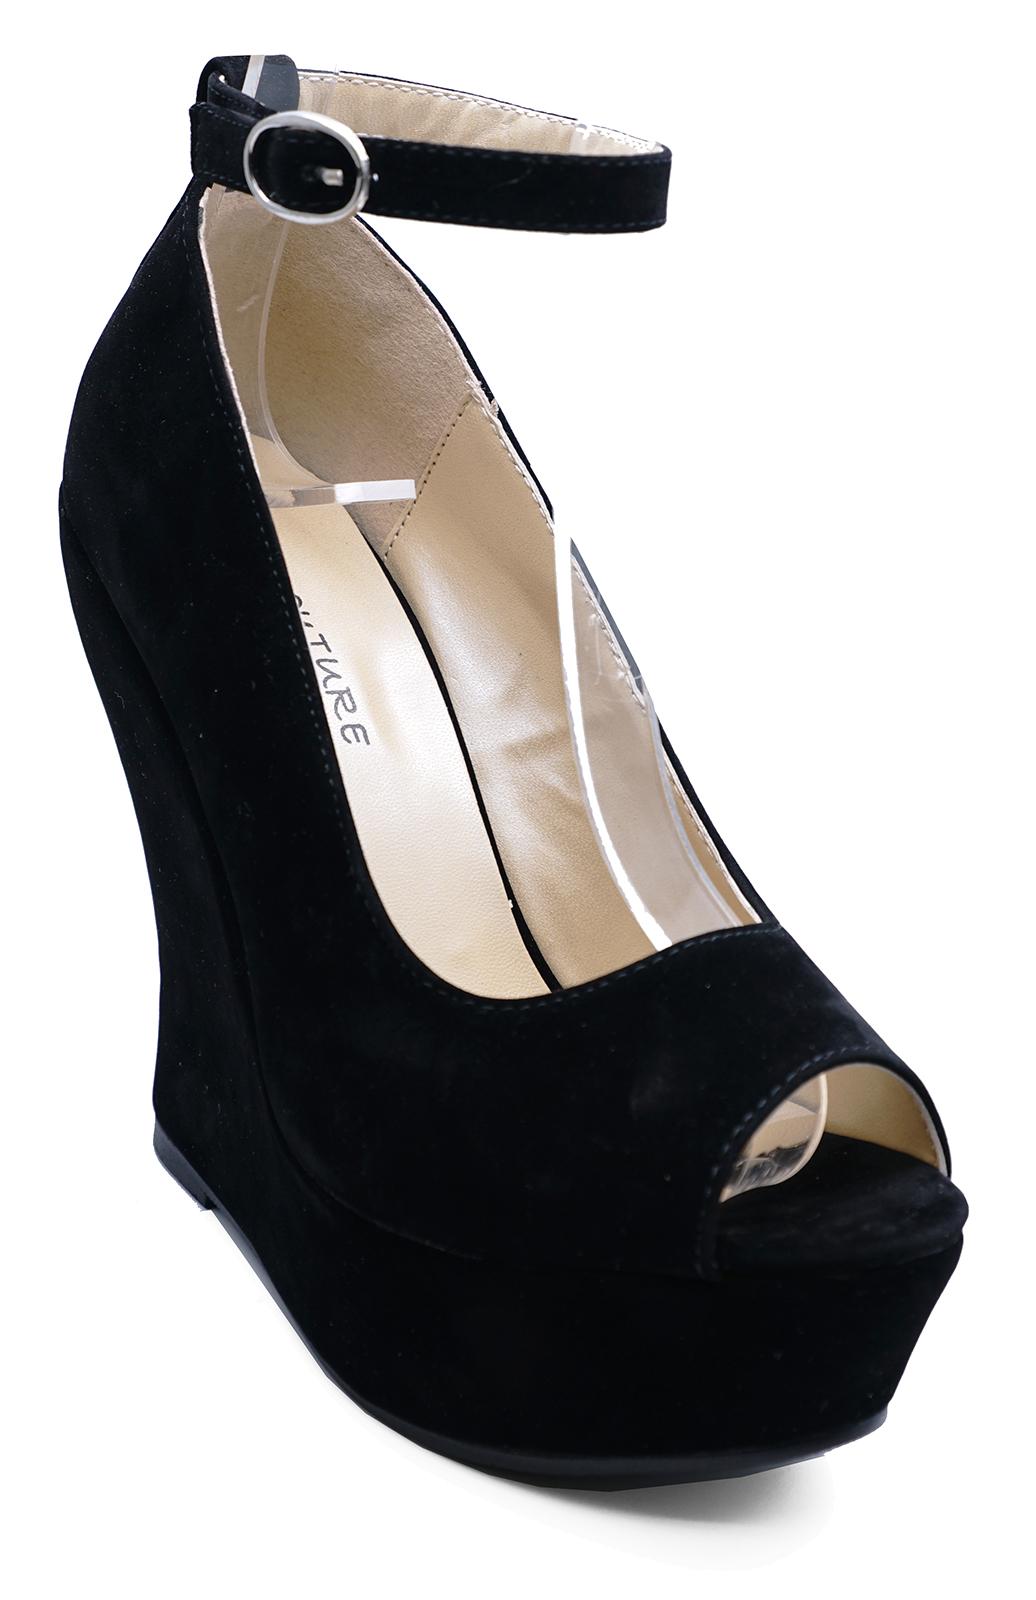 LADIES-BLACK-OPEN-TOE-SLIP-ON-WEDGE-HIGH-HEEL-PLATFORM-COURT-SHOES-SIZES-3-7 thumbnail 6